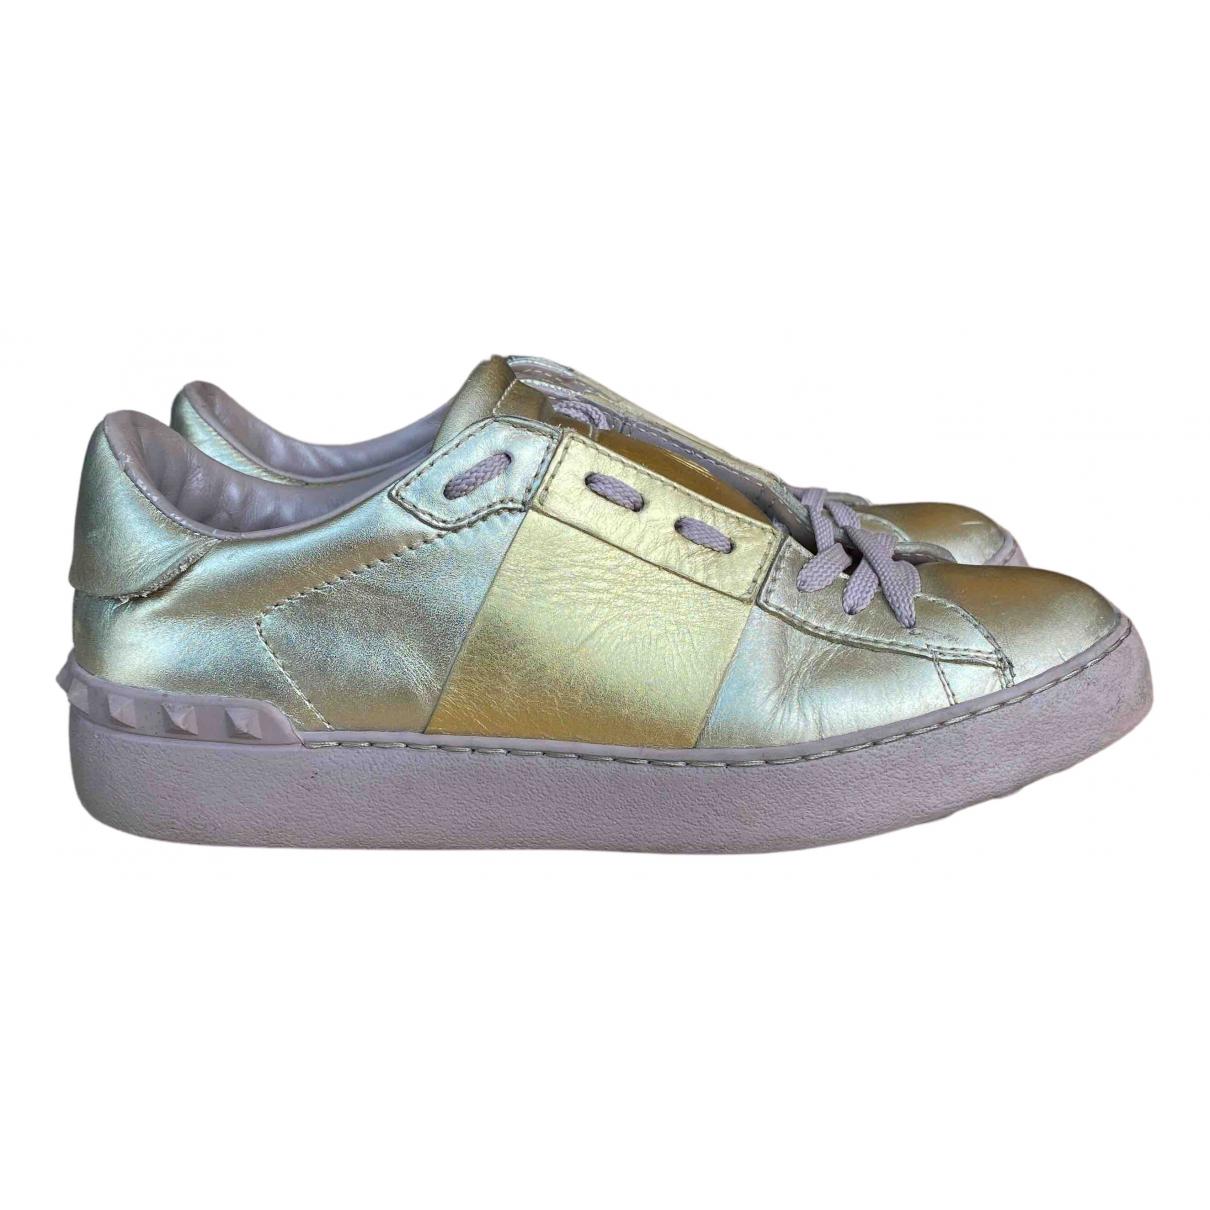 Valentino Garavani Rockstud Gold Leather Trainers for Women 38 IT